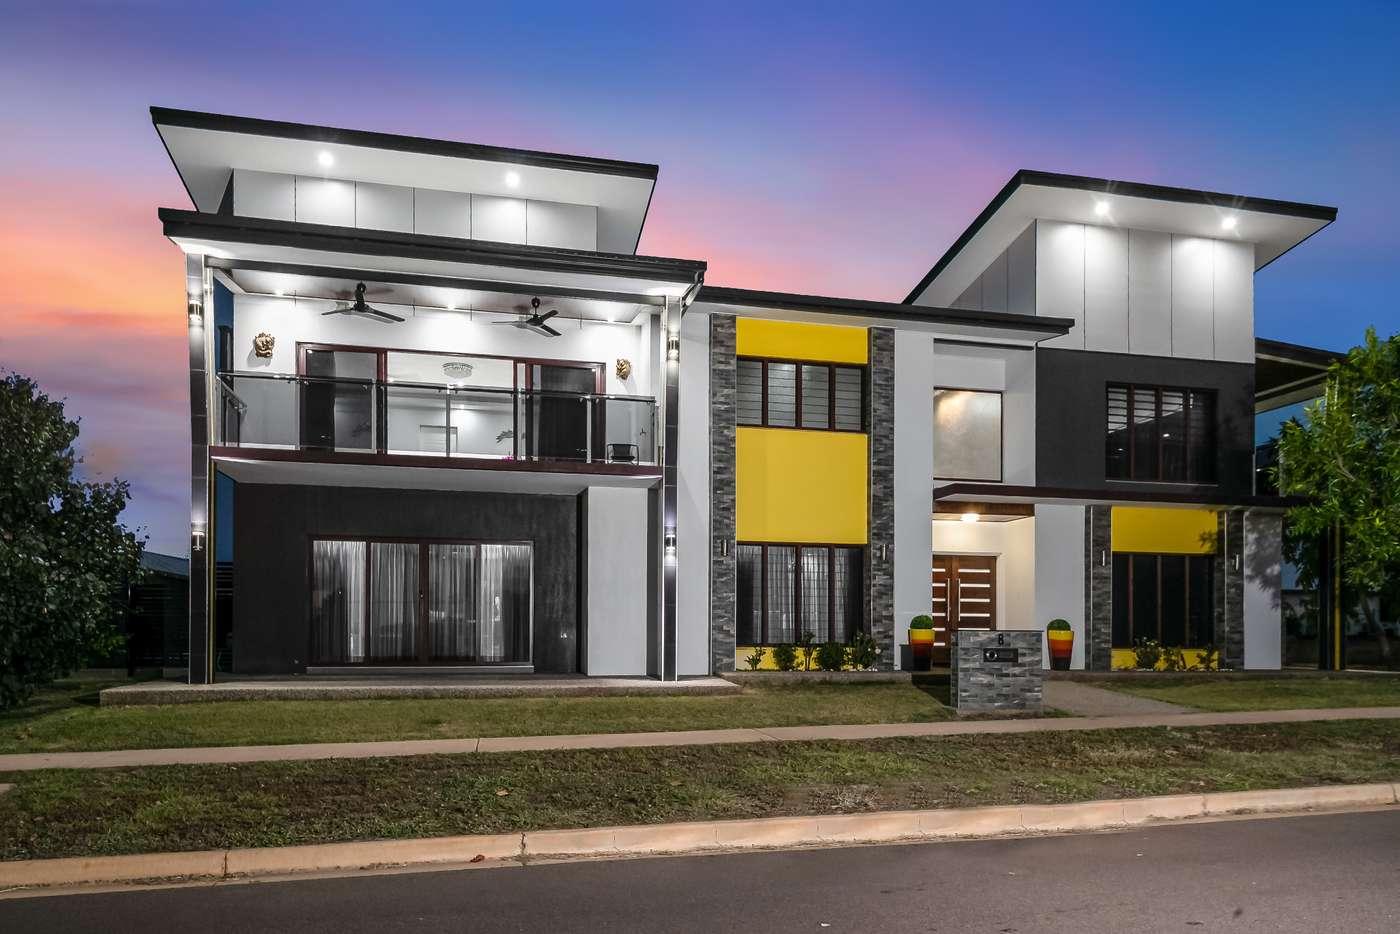 Main view of Homely house listing, 8 Farquhar Street, Muirhead NT 810